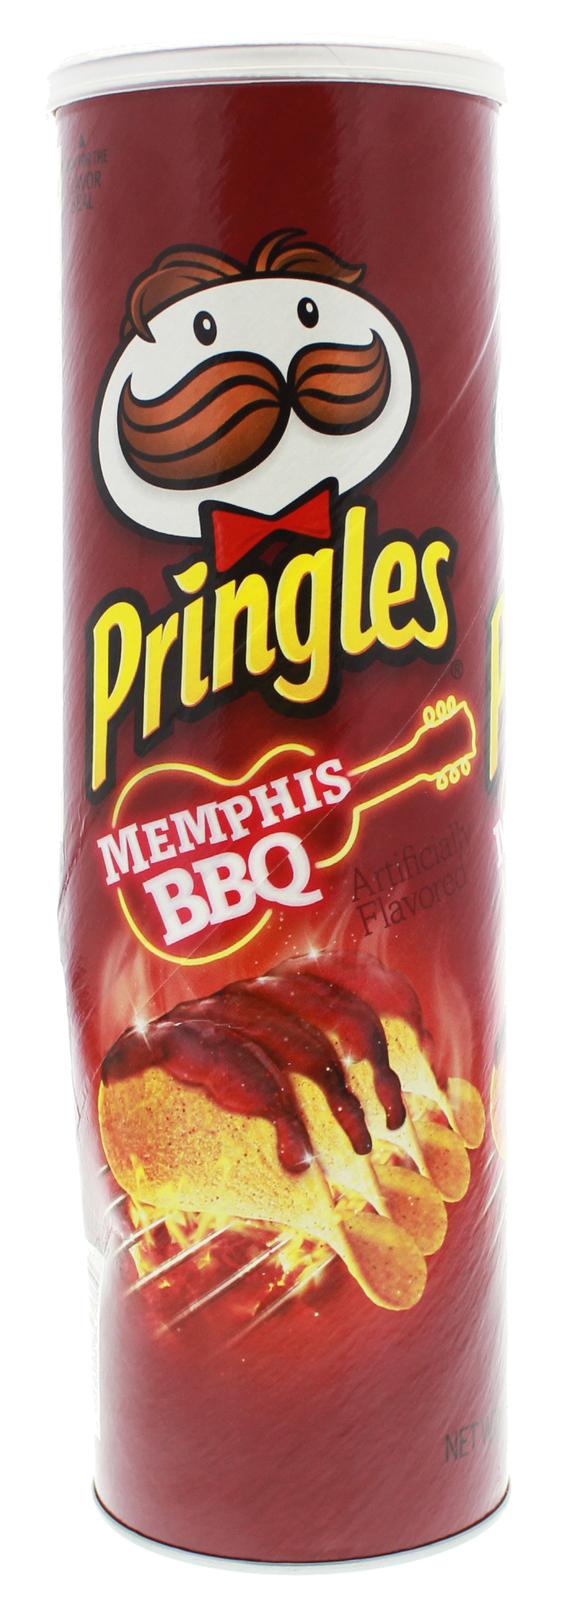 Pringles Super Stack Memphis BBQ flavour 158g image